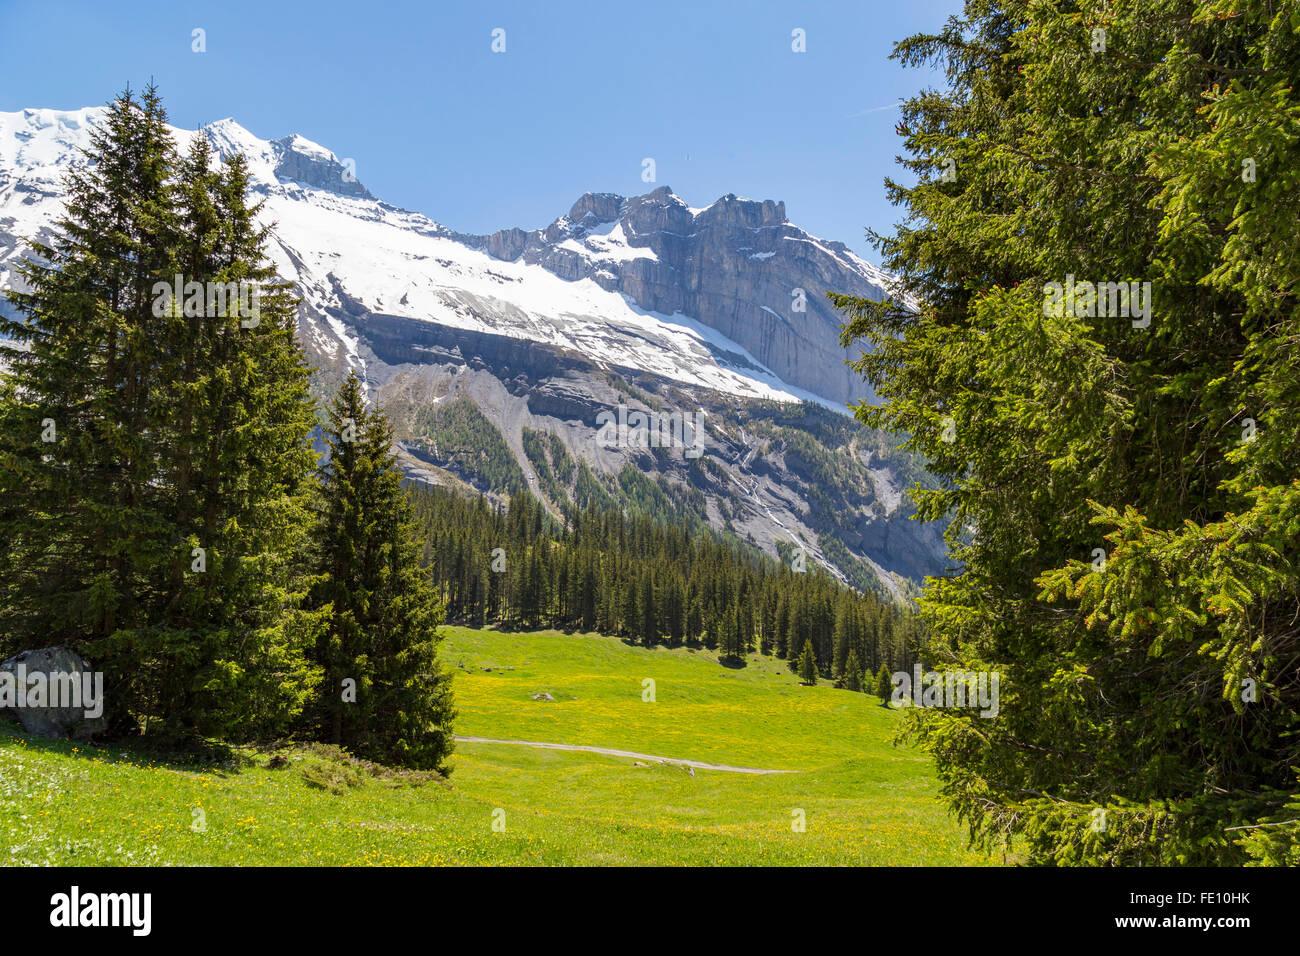 Amazing view of Swiss Alps and meadows near Oeschinensee (Oeschinen lake), on Bernese Oberland, Switzerland - Stock Image